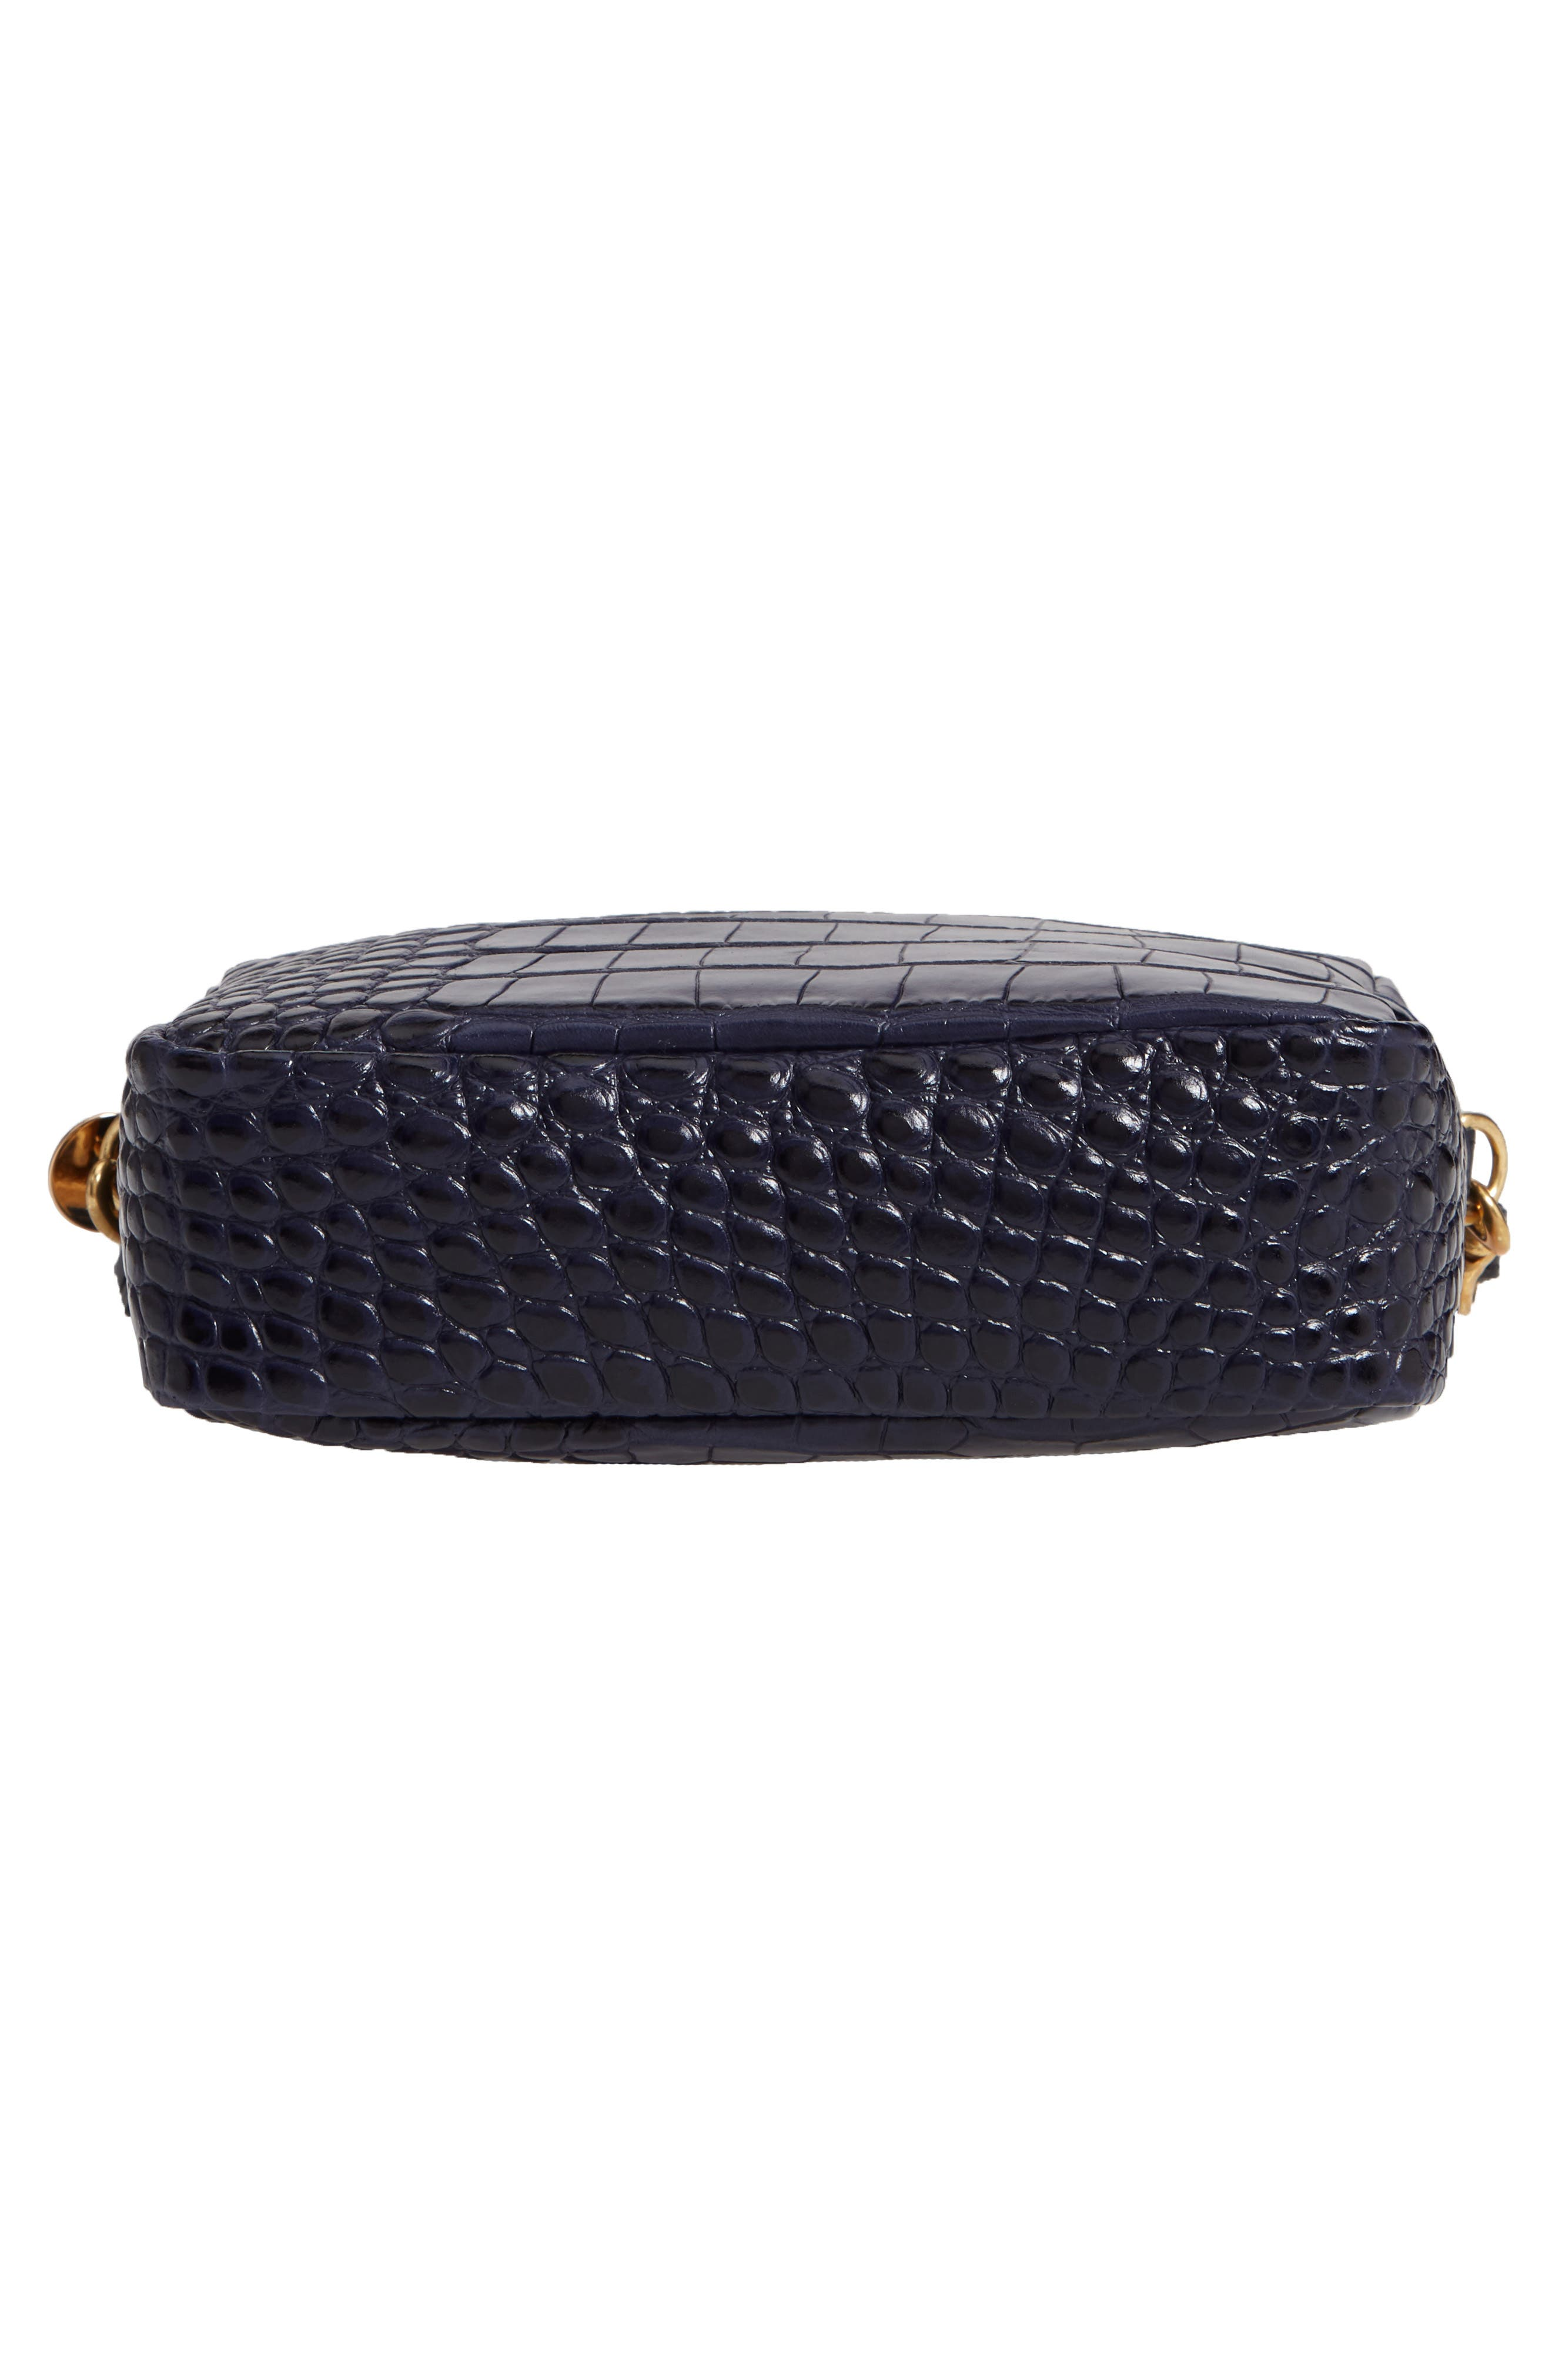 Midi Sac Croc Embossed Leather Crossbody Bag,                             Alternate thumbnail 6, color,                             MIDNIGHT CROCO